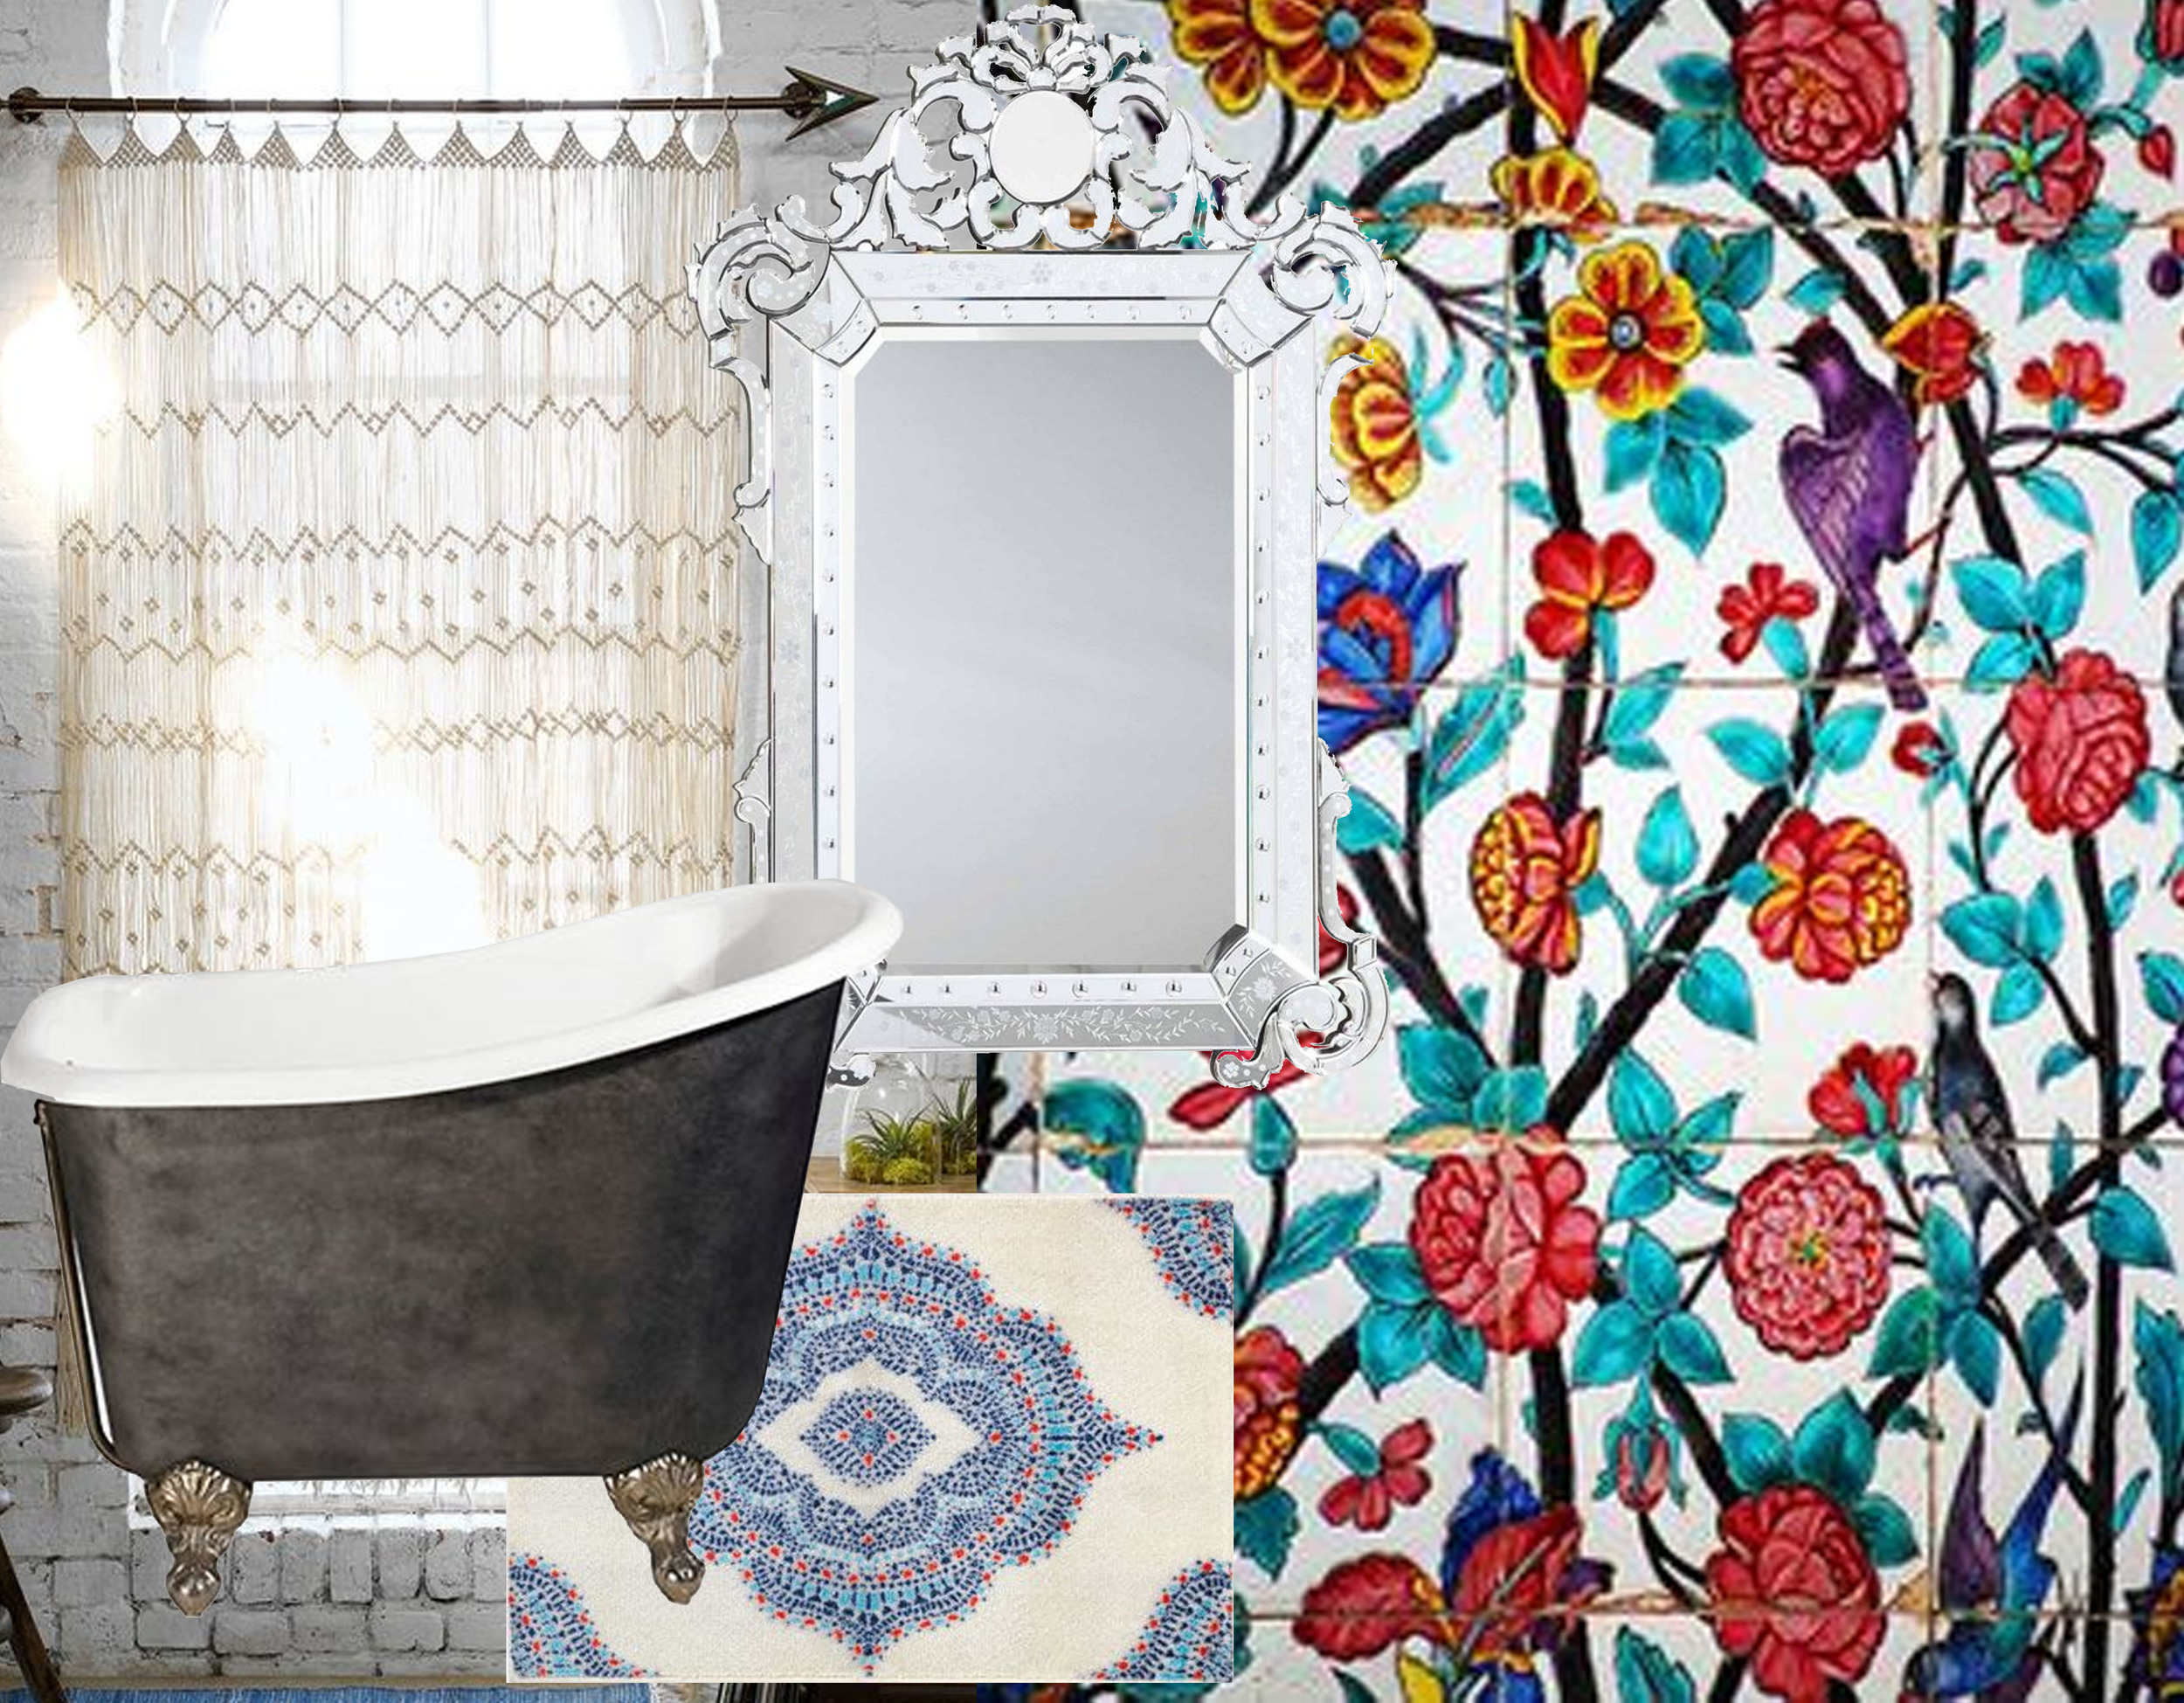 macrame wall hanging via  Pinterest  - bathtub  Albion  - small rug Doftrik  IKEA  - Venetian mirror  One Kings Lane  - hand painted tiles via  Pinterest